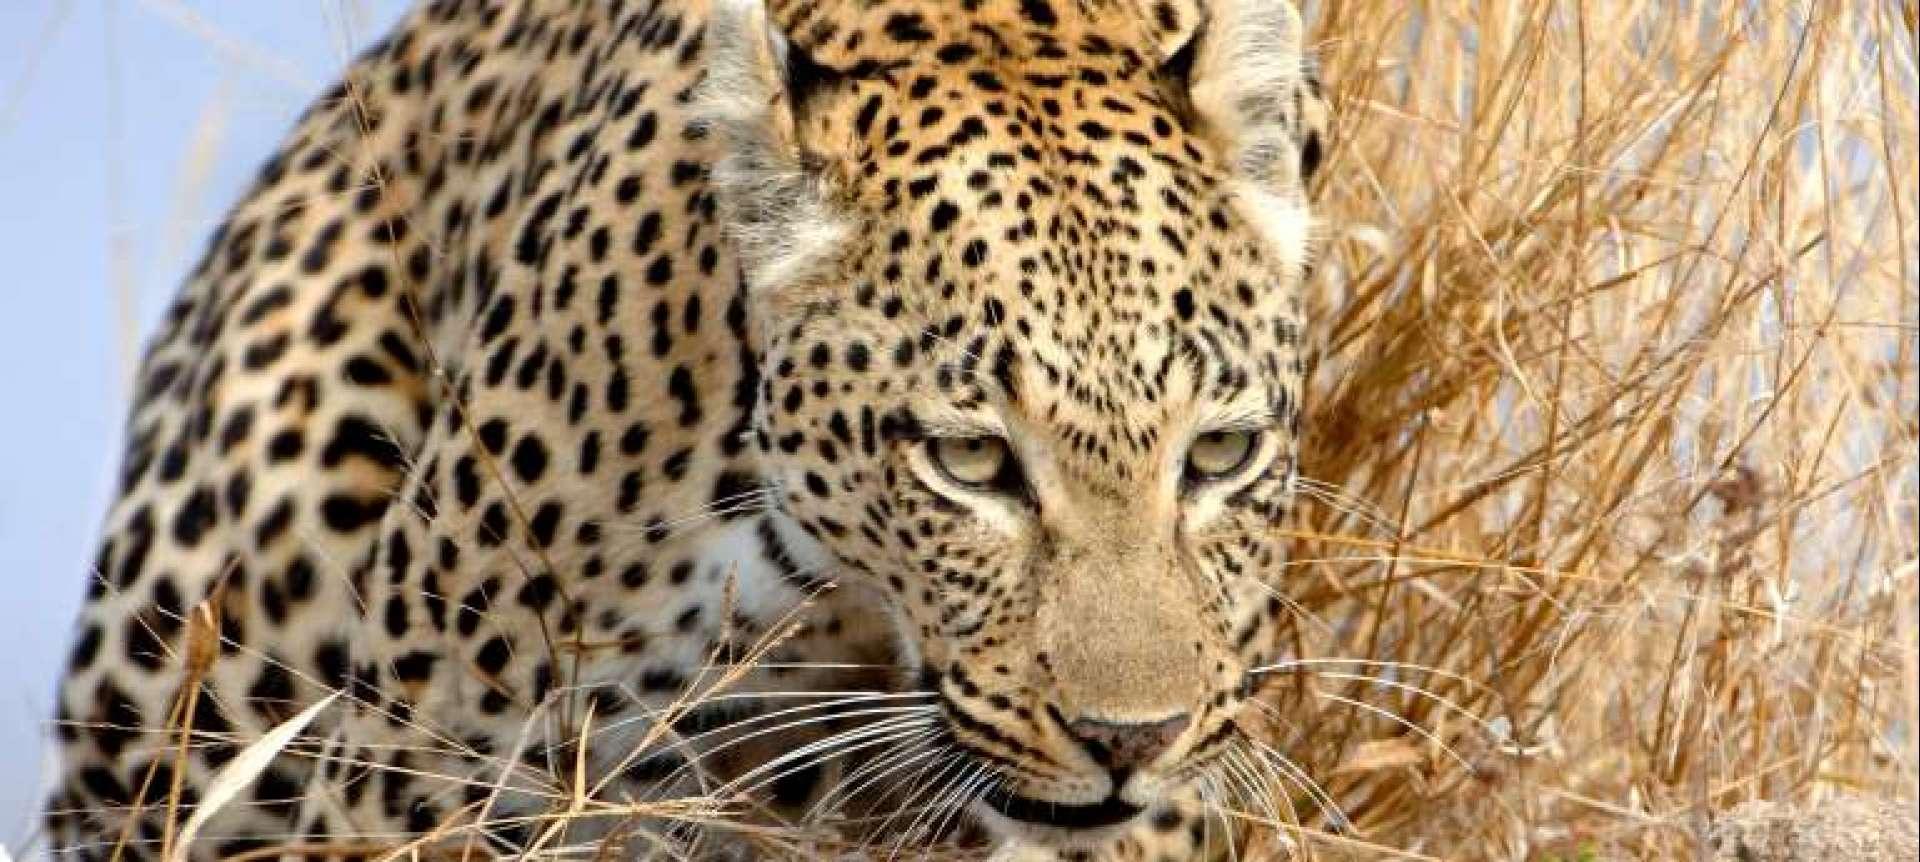 Experience a mobile camping safari in Botswana - Africa Wildlife Safaris